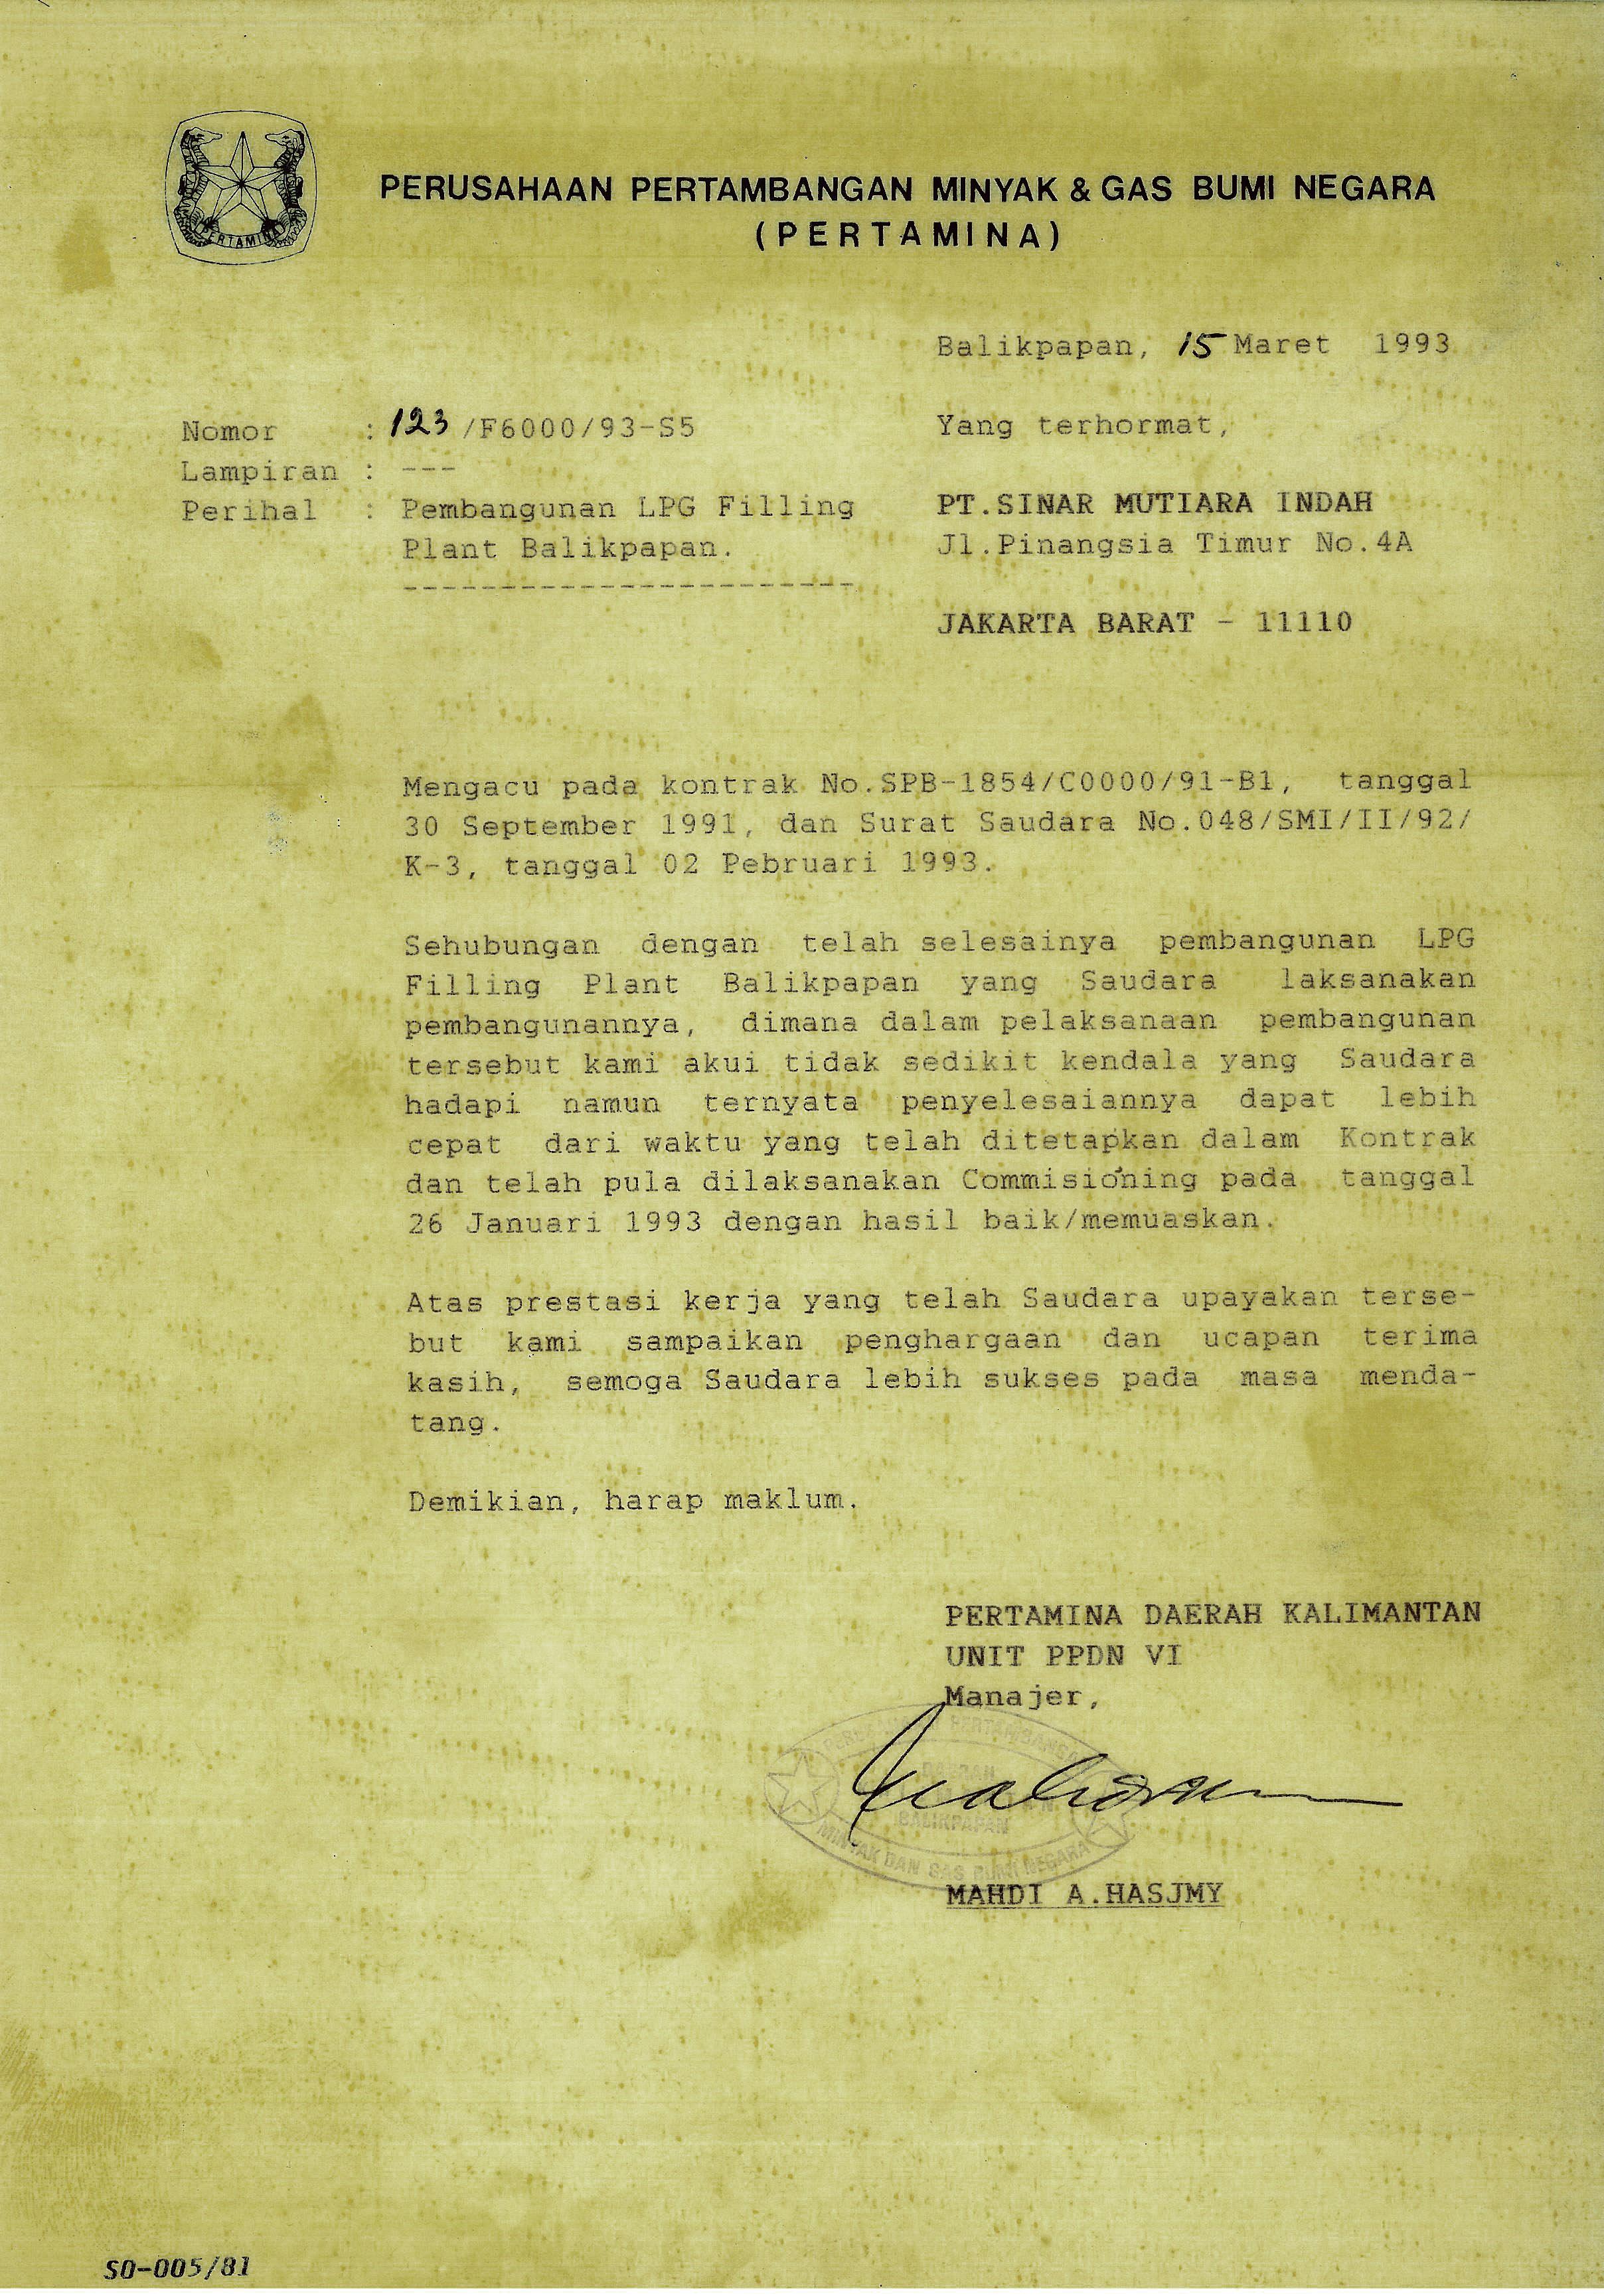 1993 Pembangunan LPG Filling Plant - Balikpapan (PERTAMINA)